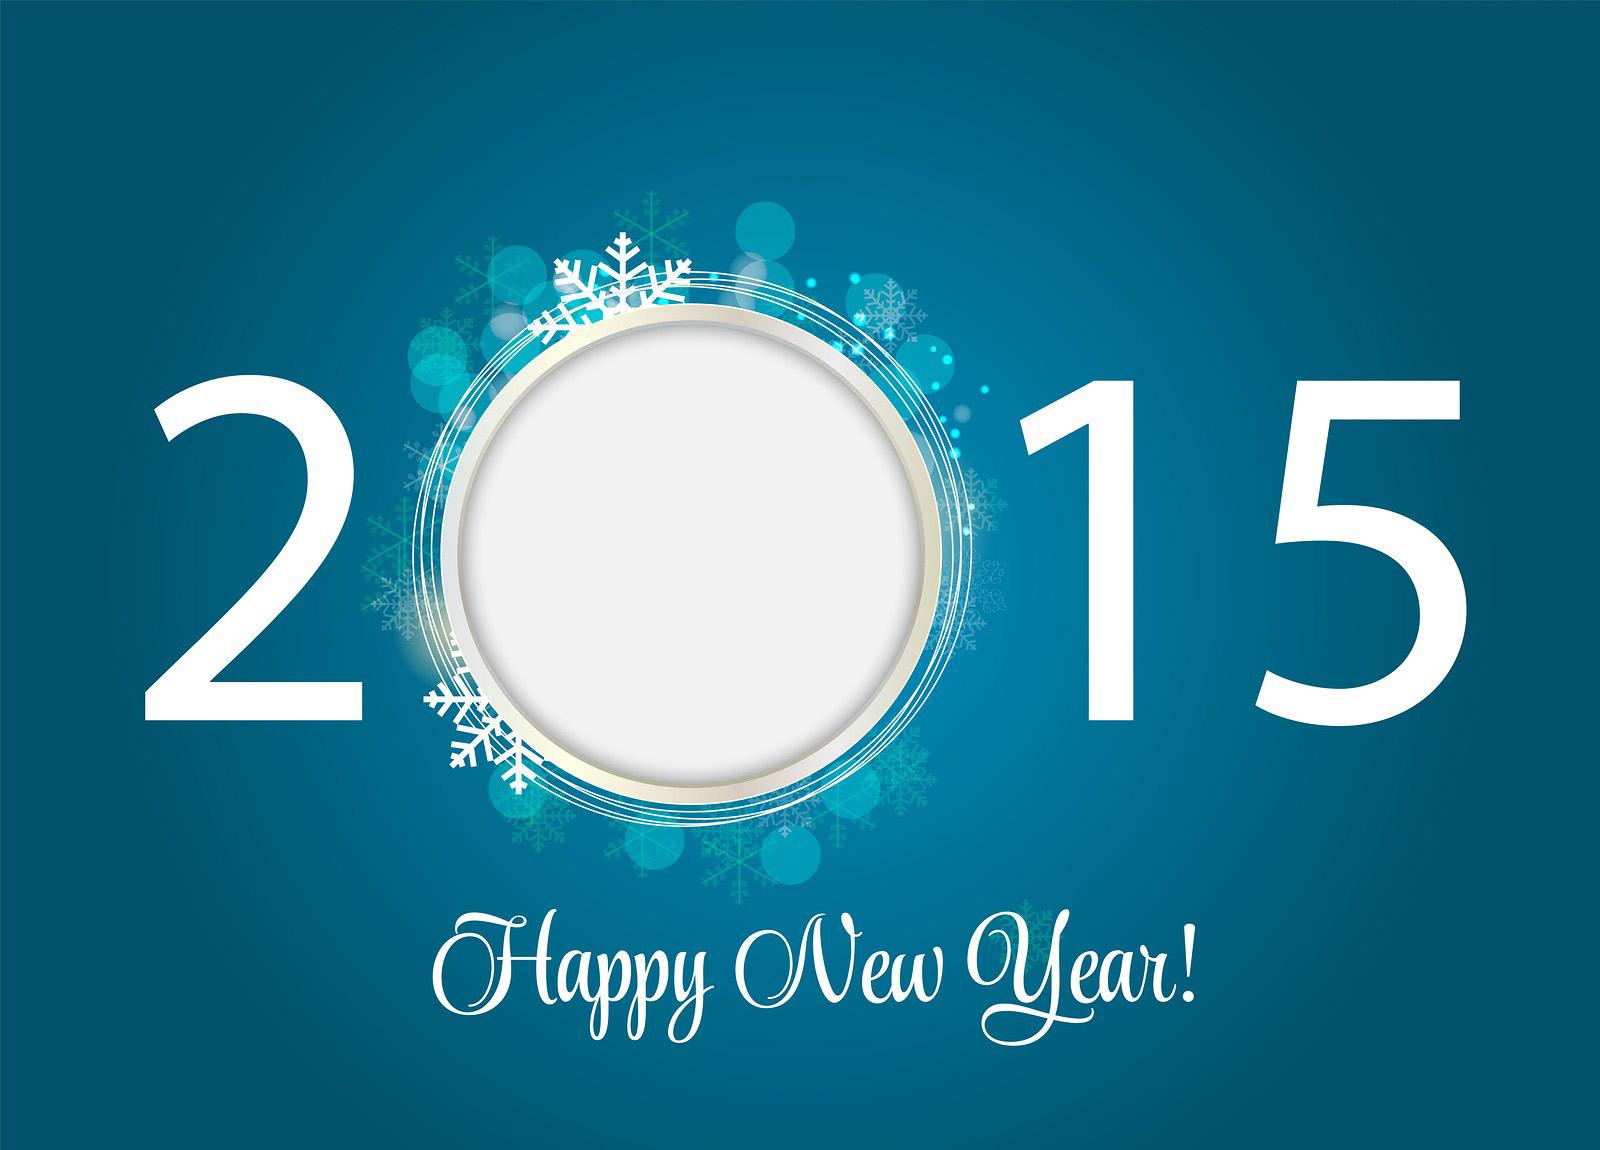 Happy New Year Wallpaper 2015 Snowflake